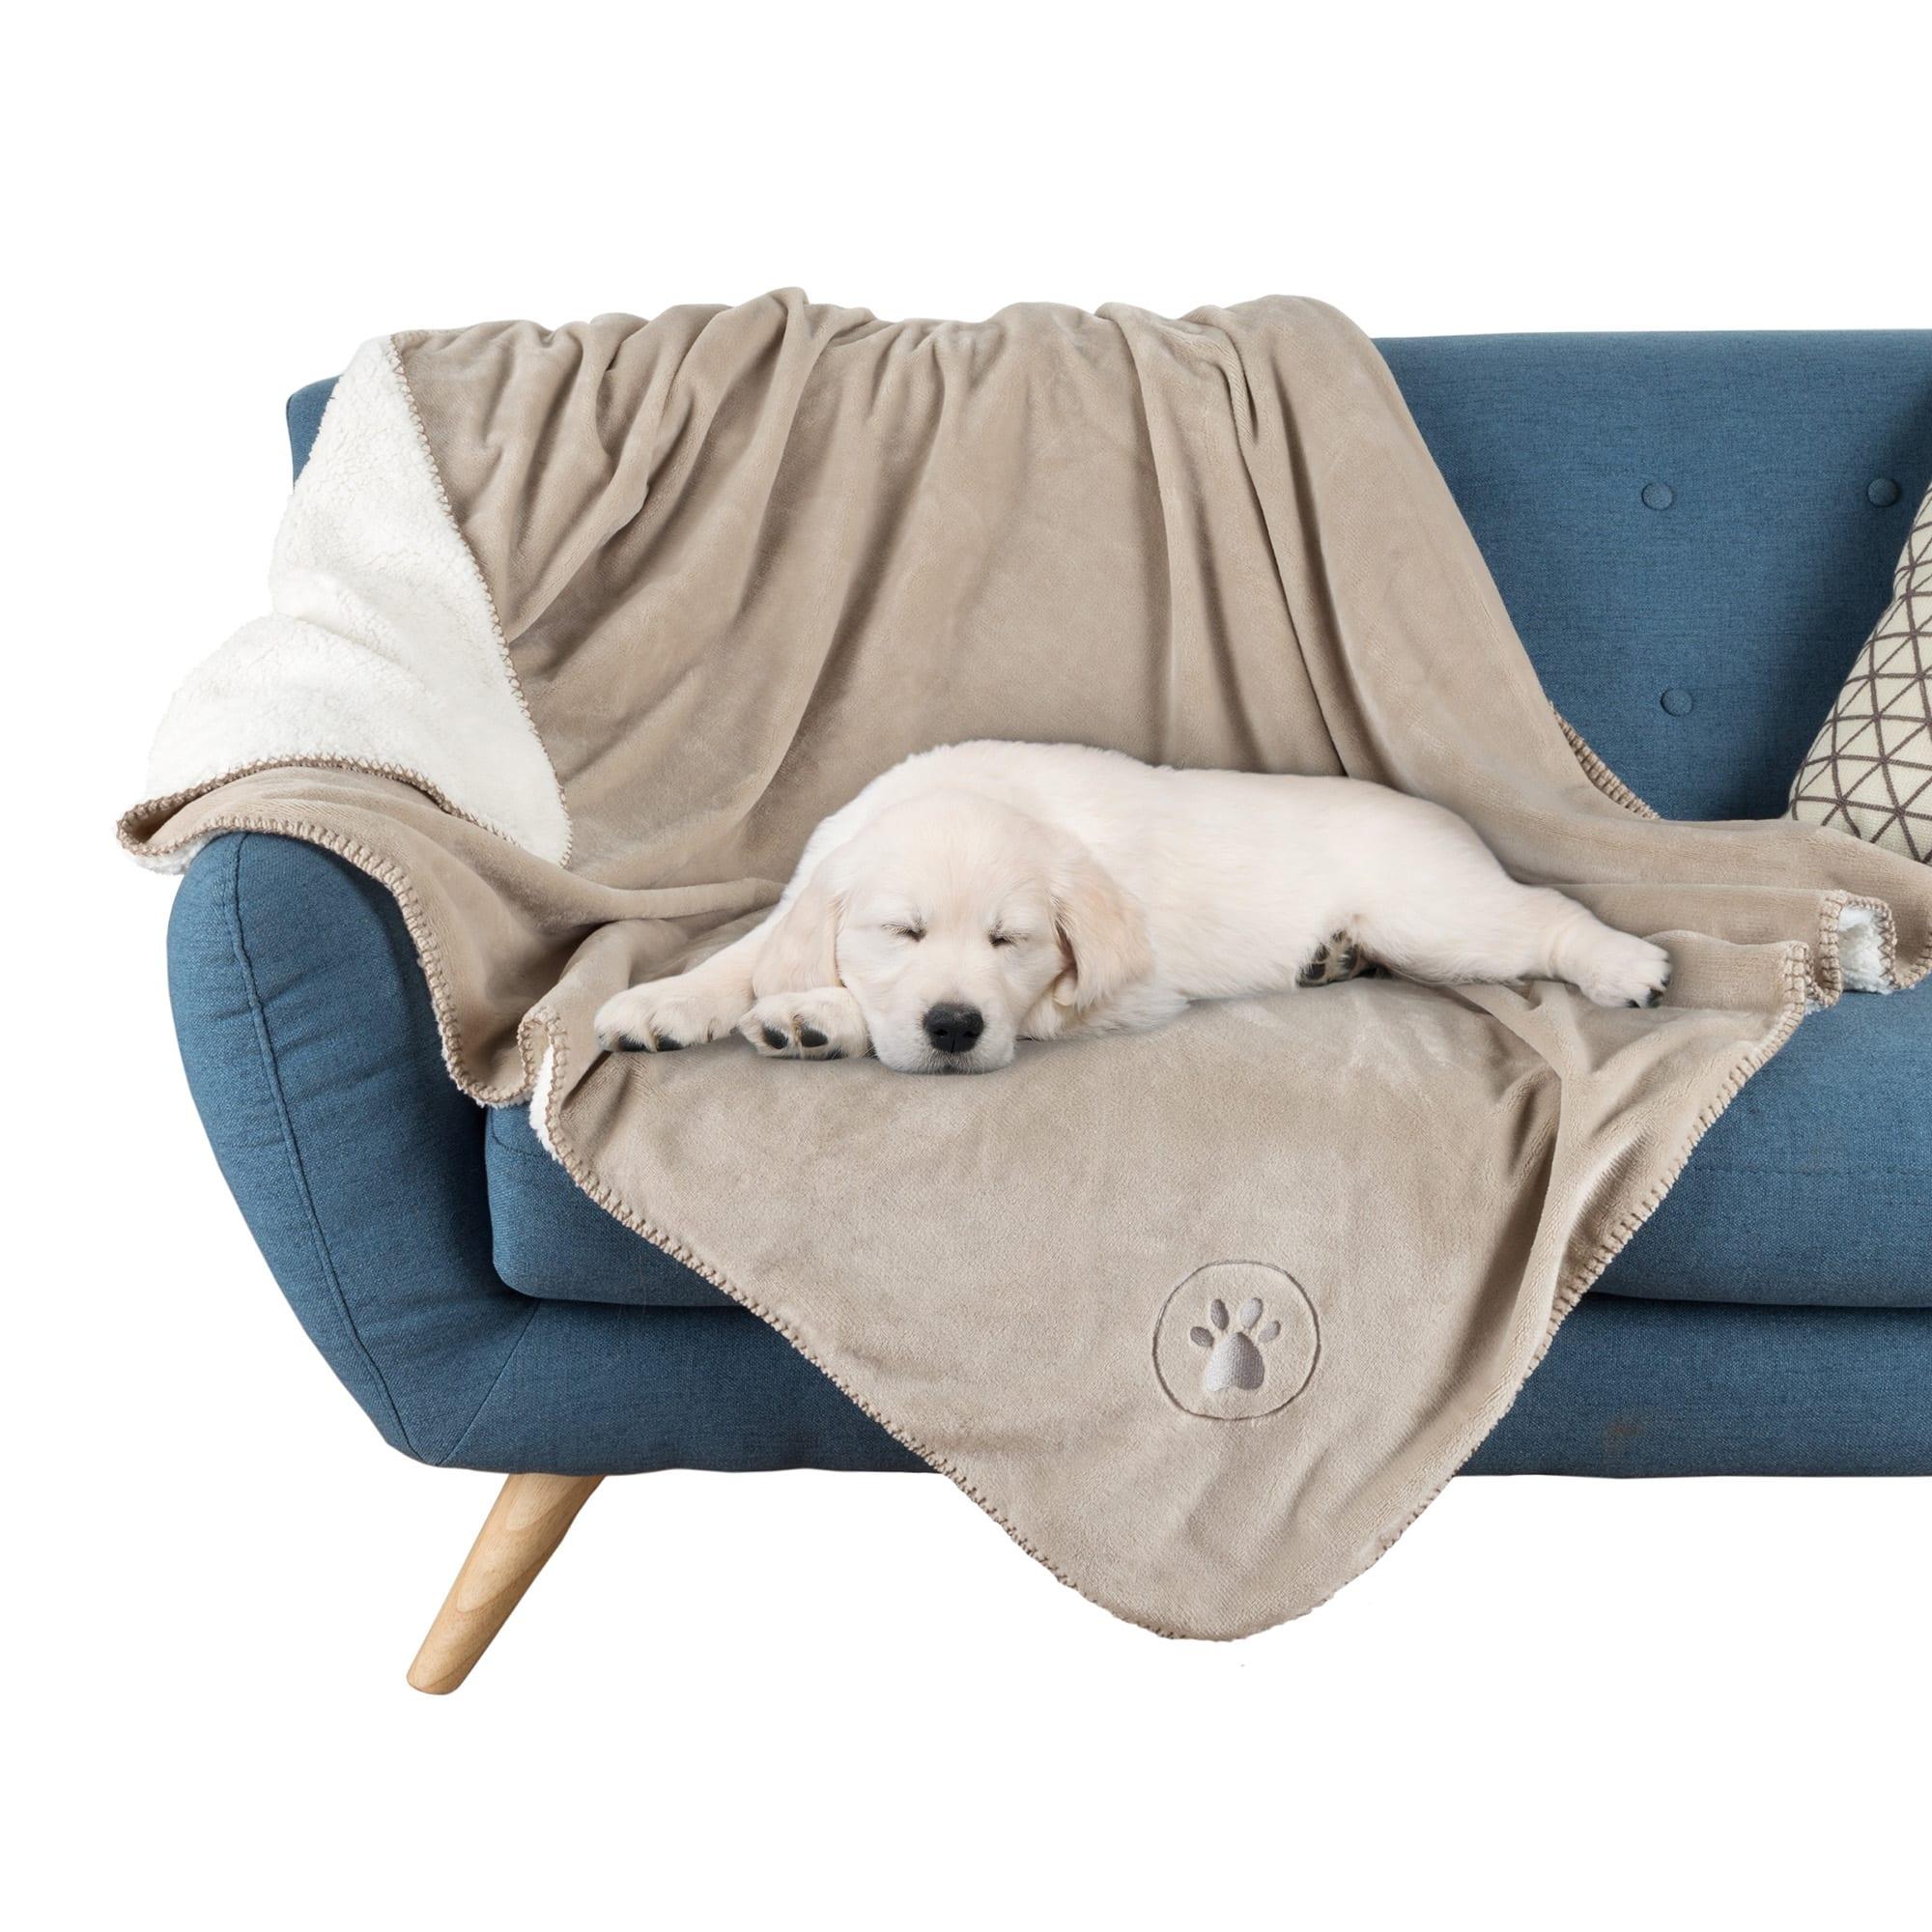 water proof dog blanket